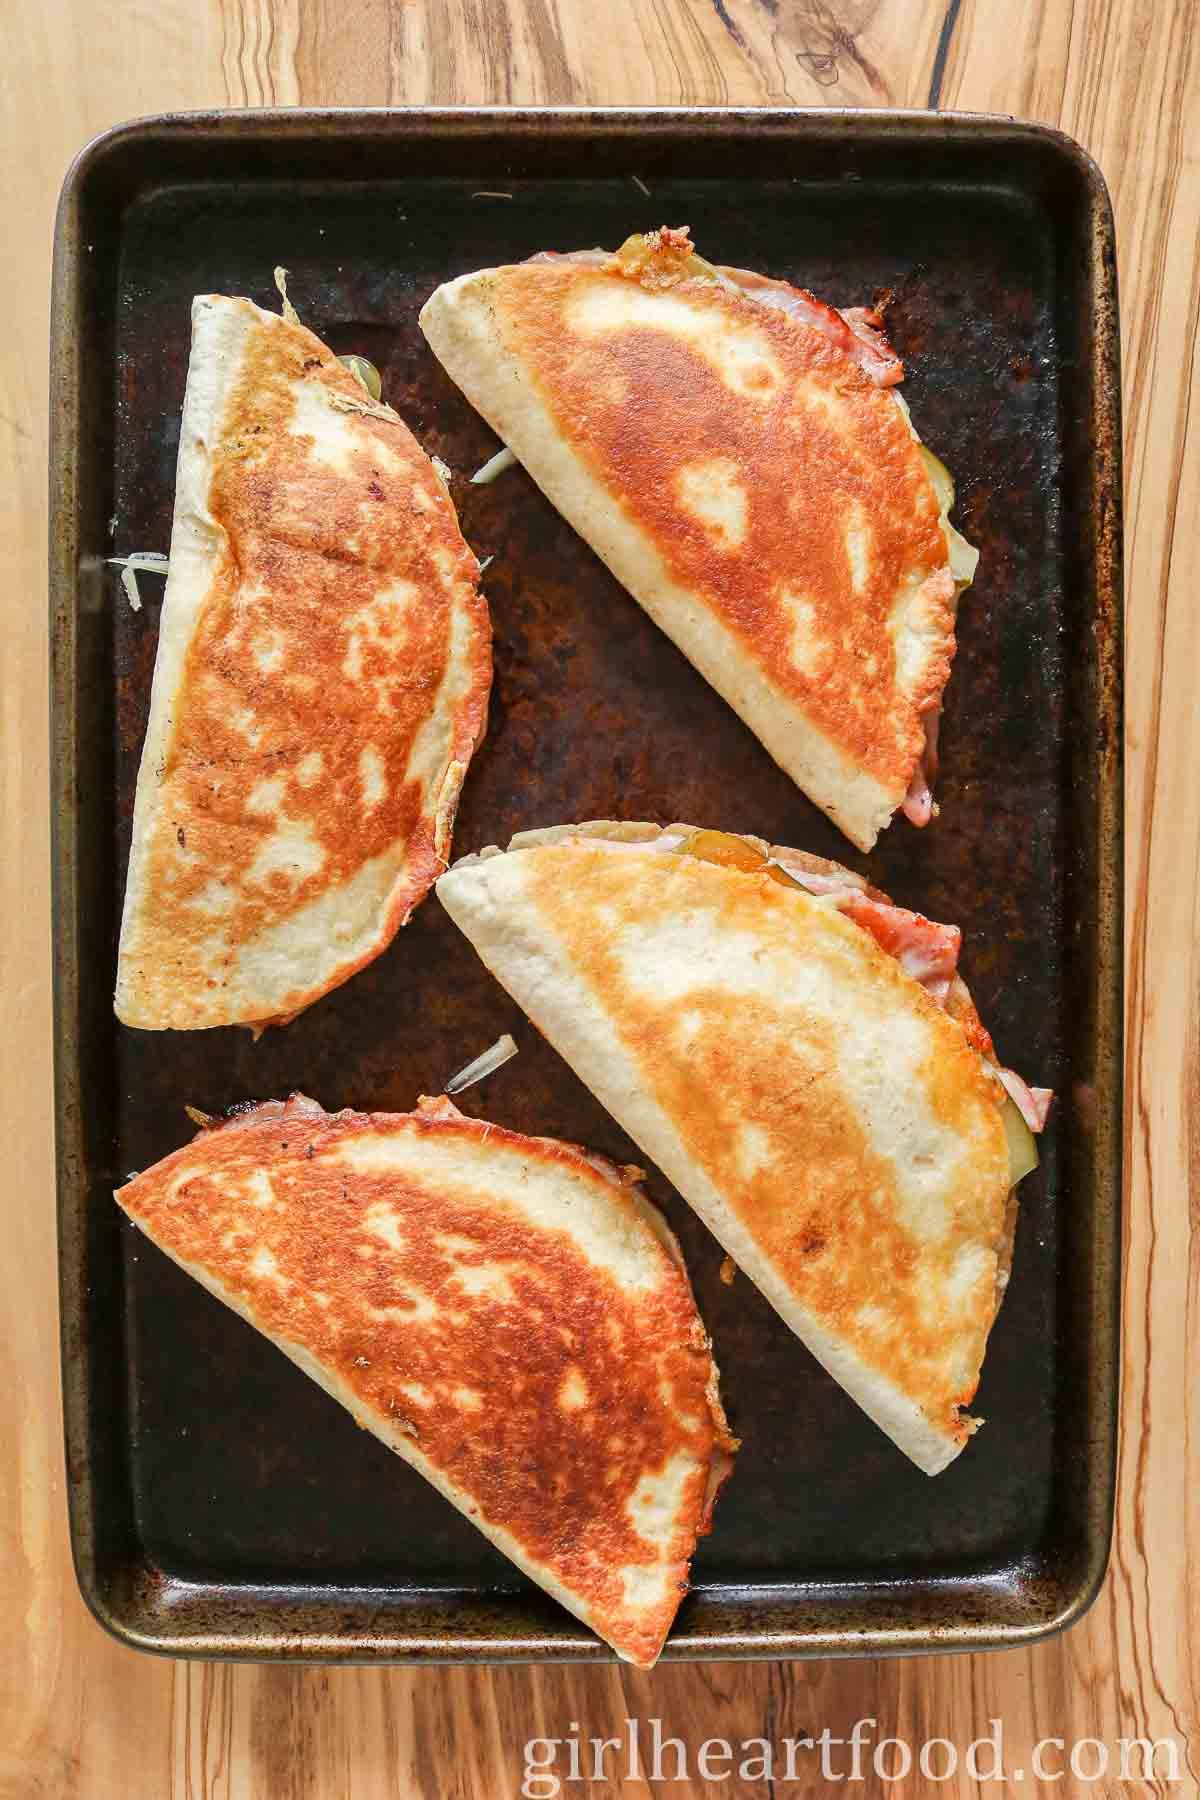 Four crispy quesadillas on a sheet pan.